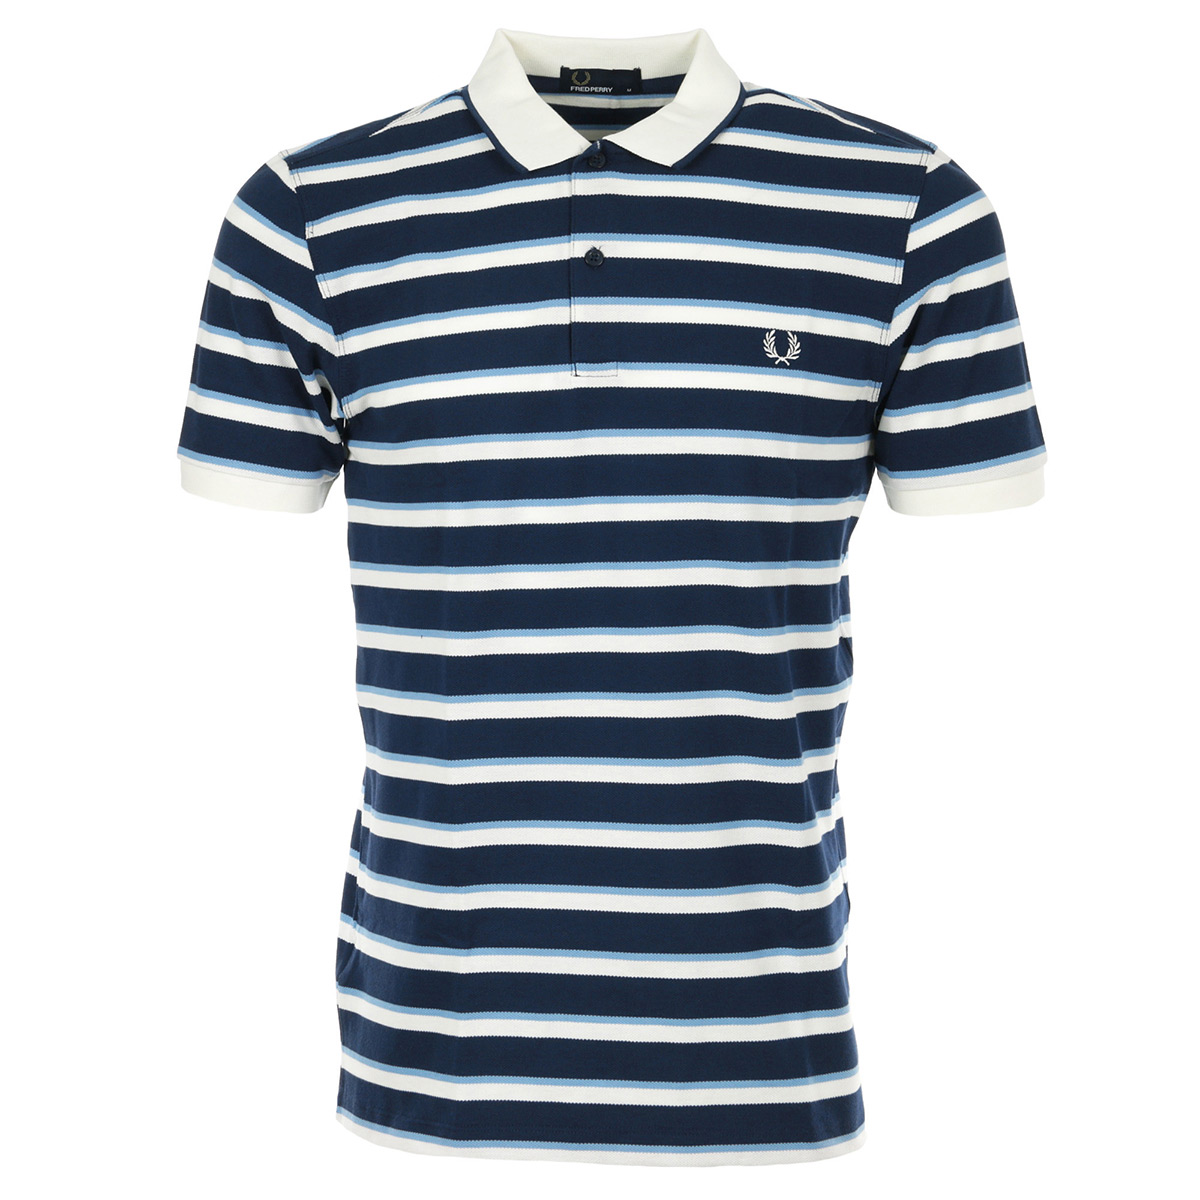 8f078e39d33 Fred Perry Fine Stripe Pique Shirt M5572266